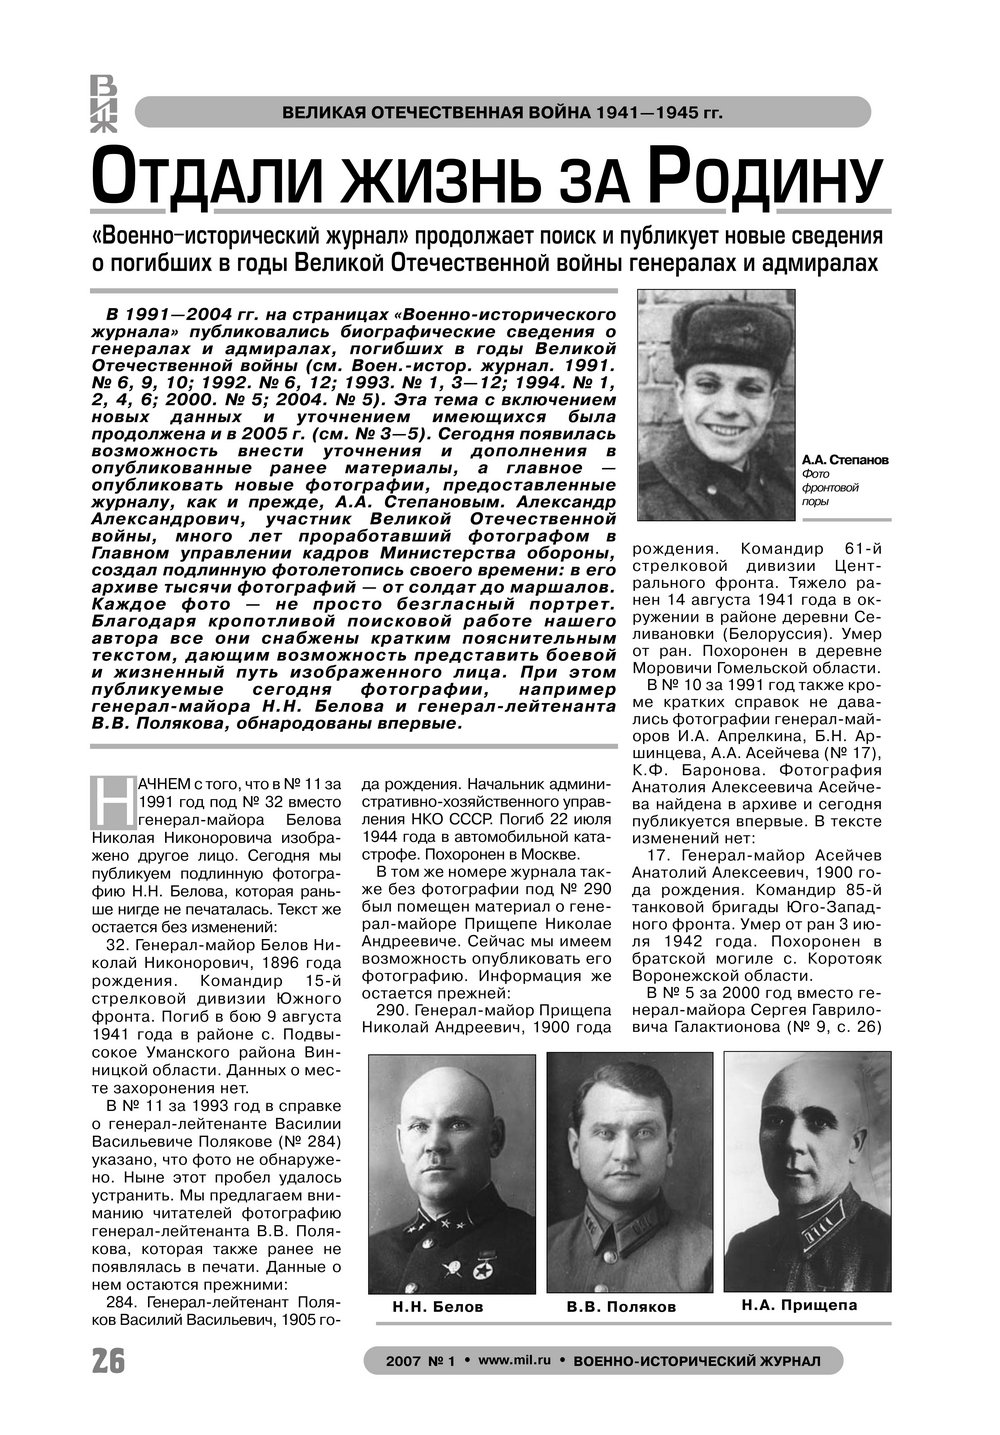 http://images.vfl.ru/ii/1367482295/460e4e1e/2262501.jpg